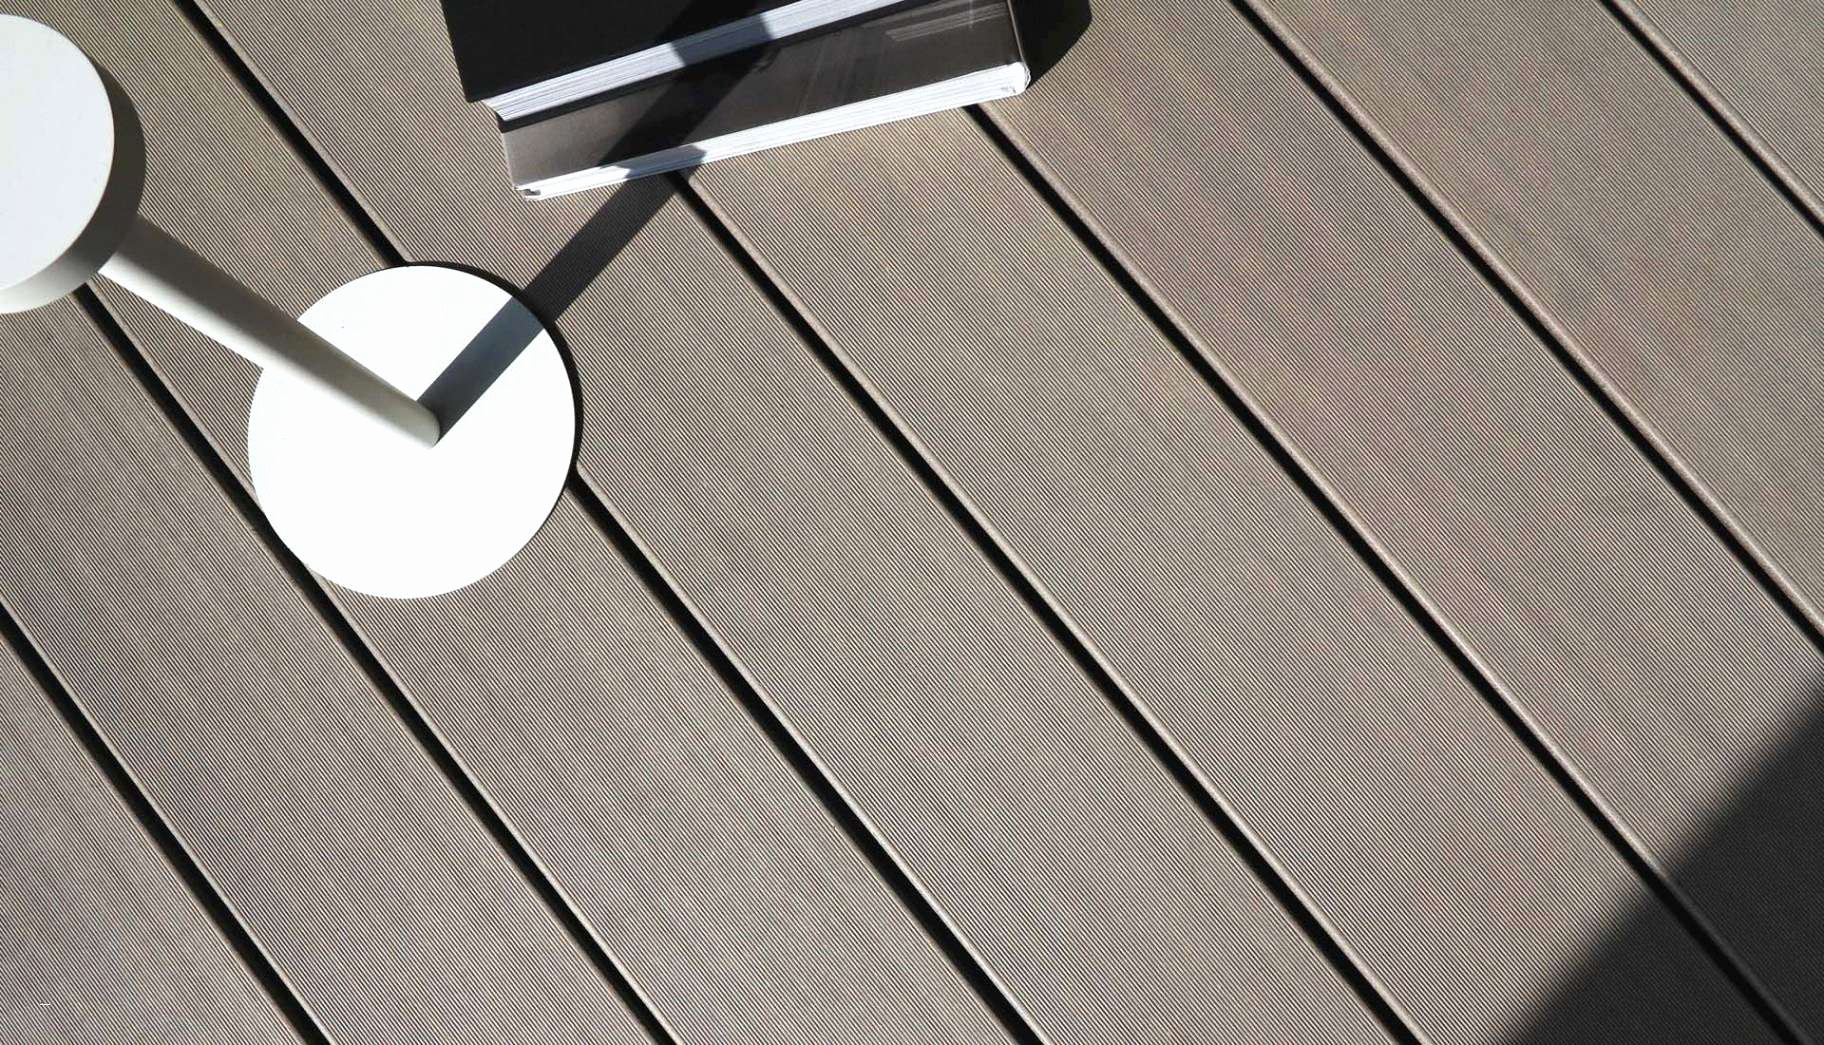 terrassenmobel selber bauen schon 31 schon gunstig terrasse bauen of terrassenmobel selber bauen